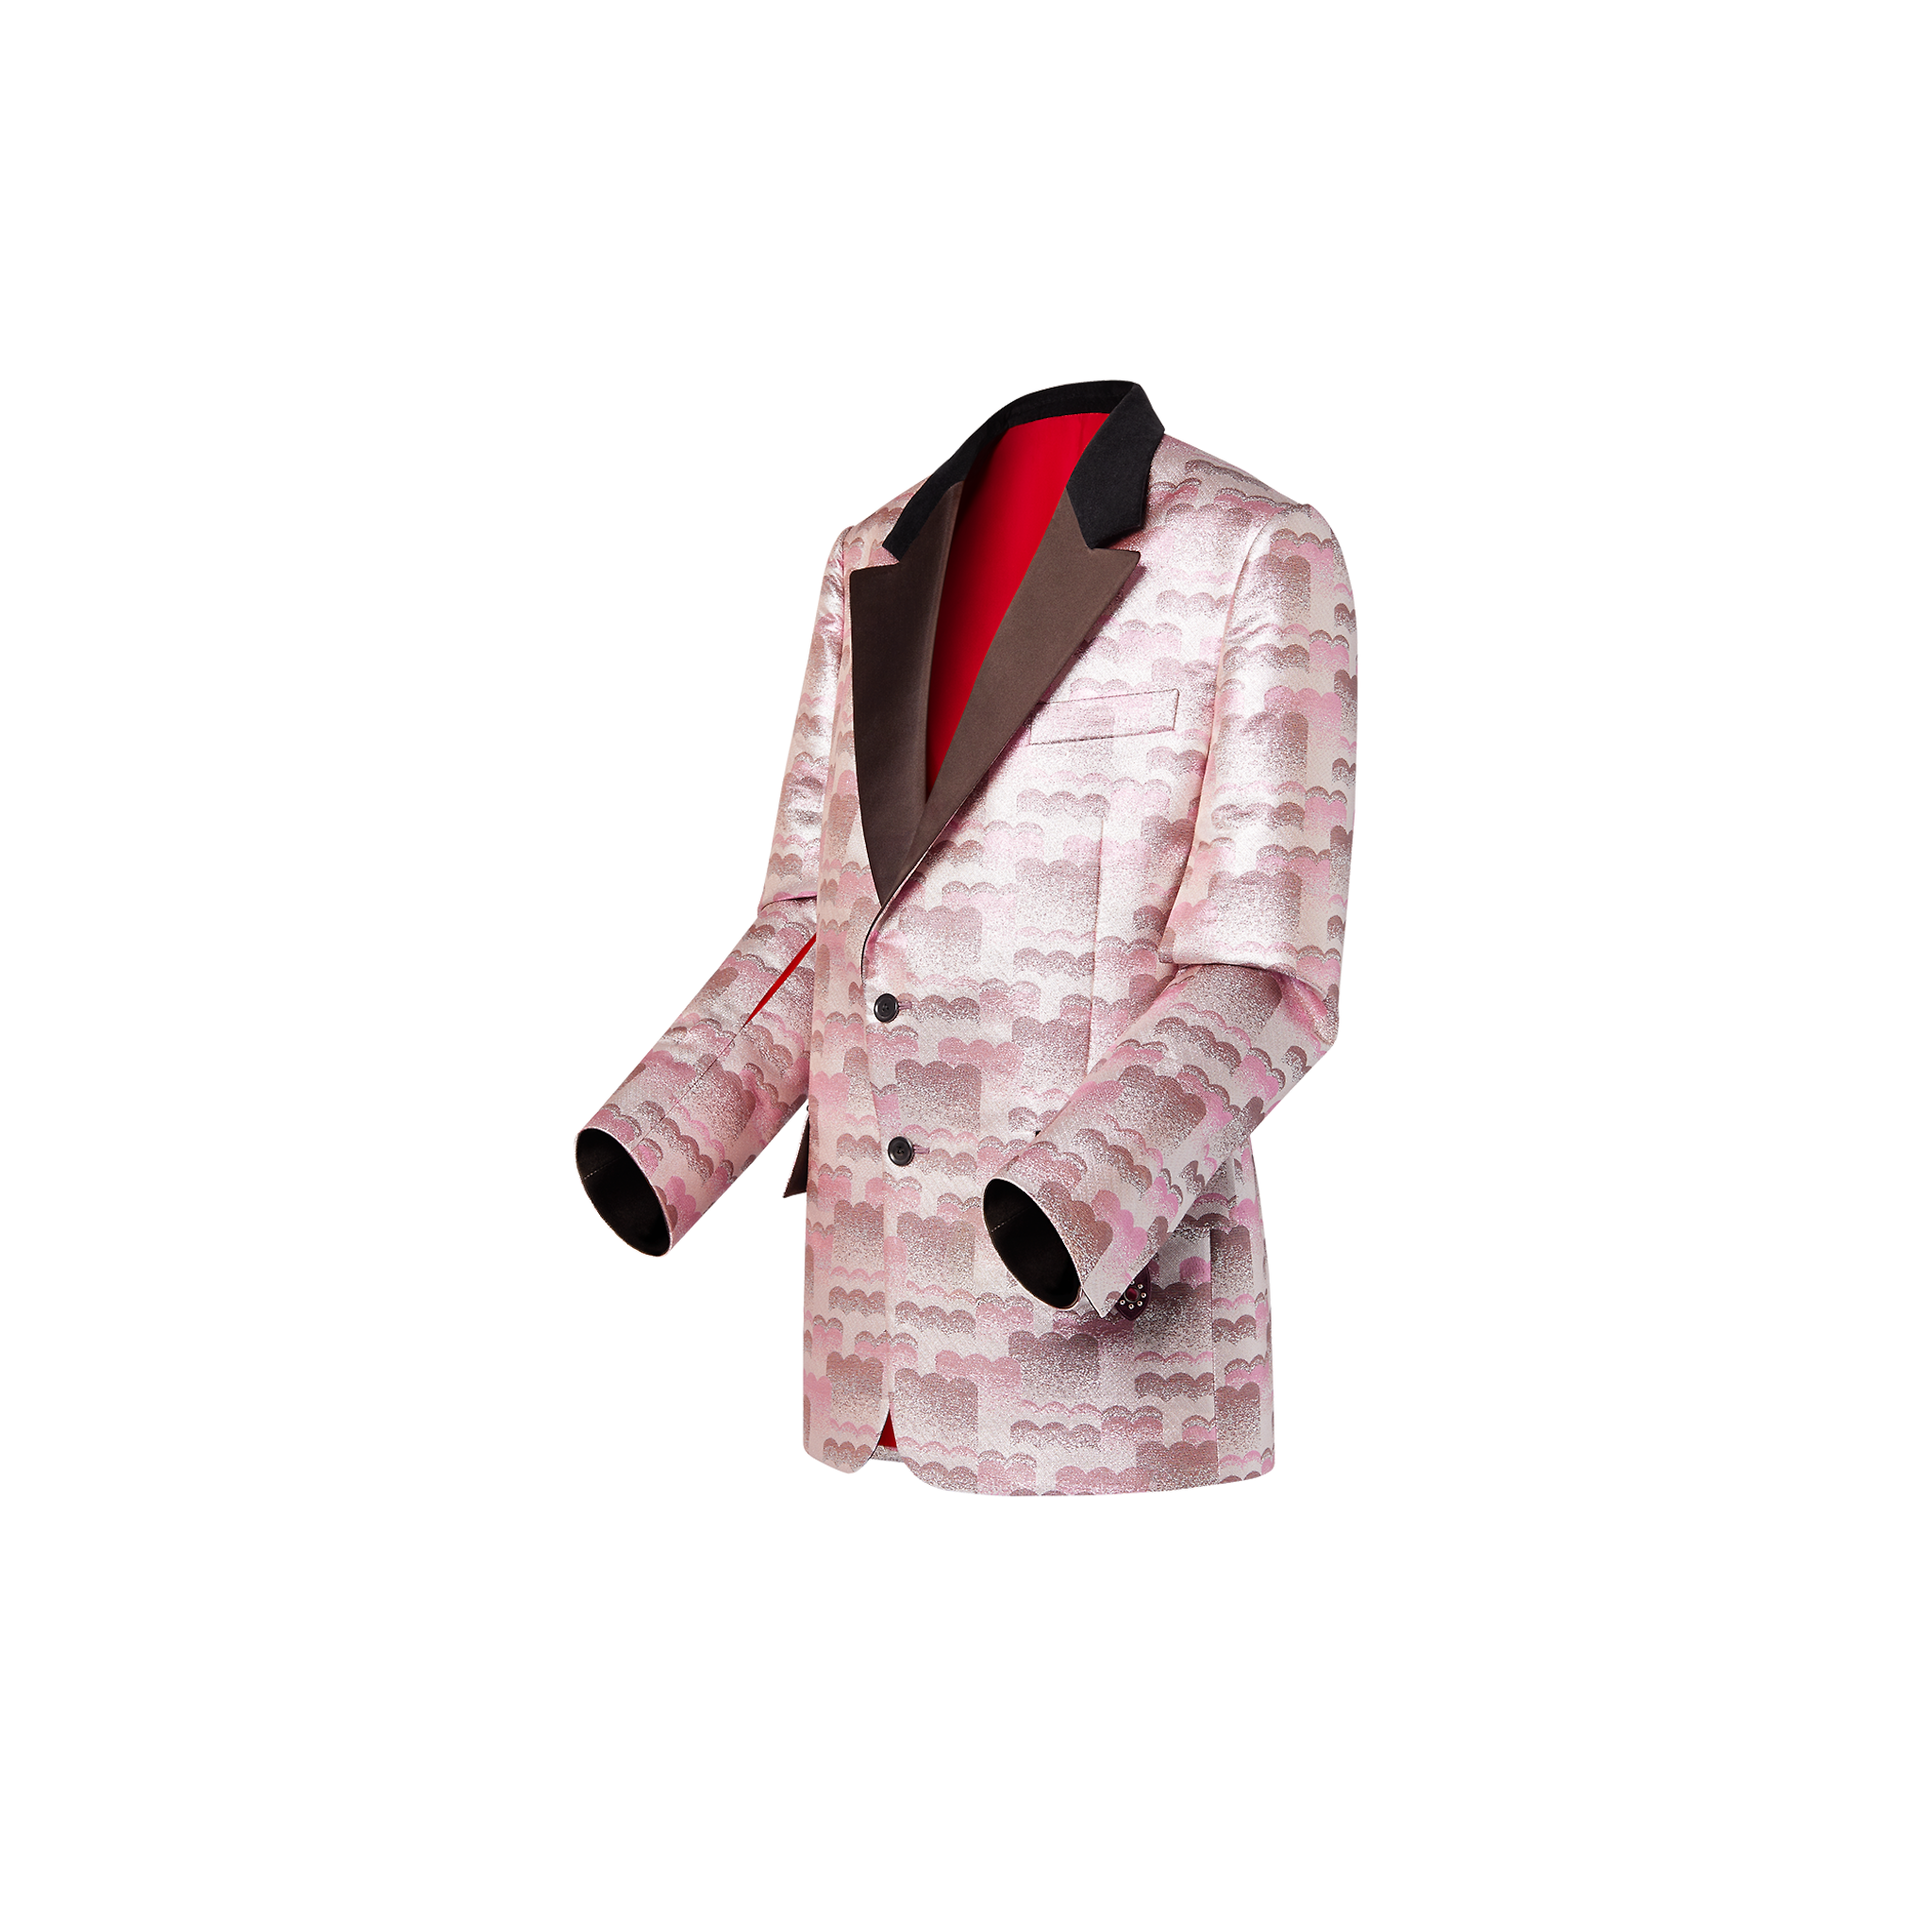 Louis Vuitton Cloud jacquard tuxedo jacket